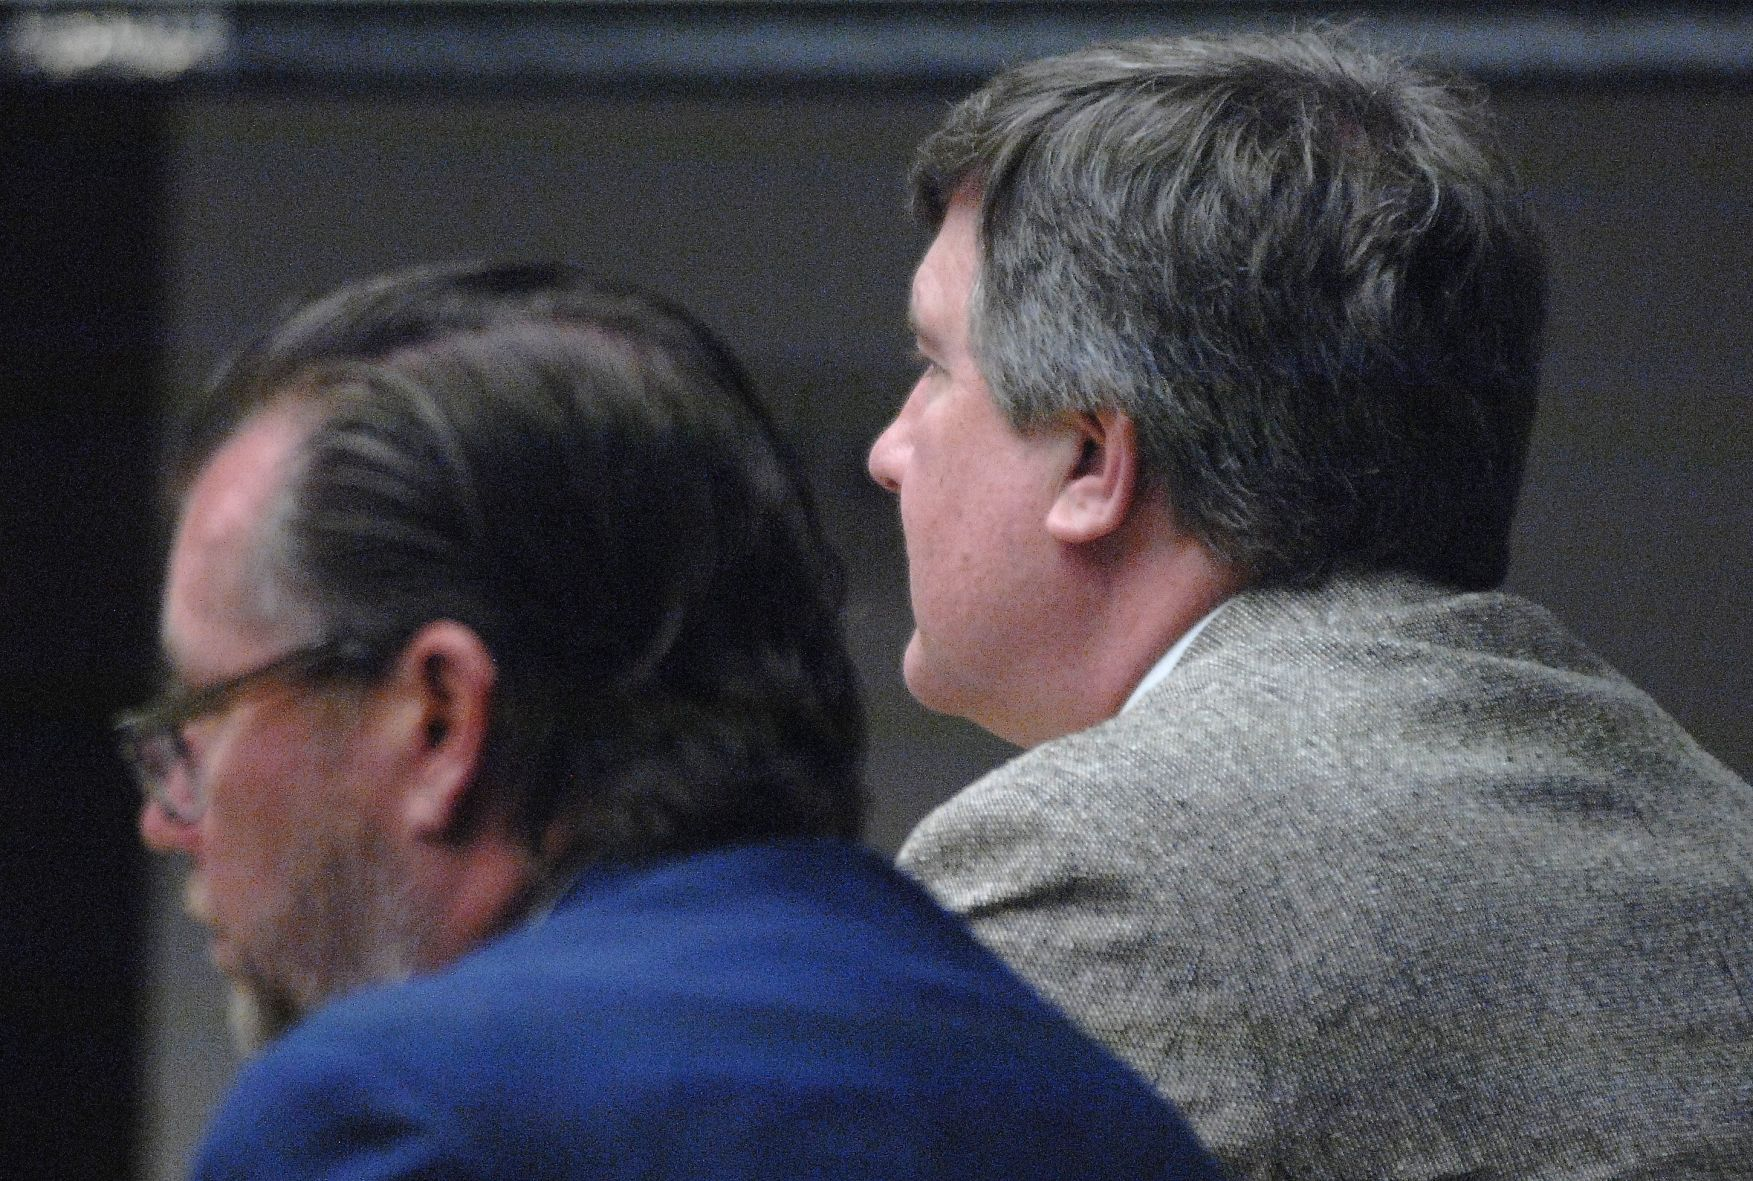 Zimmerman withdraws bond refund request lists house